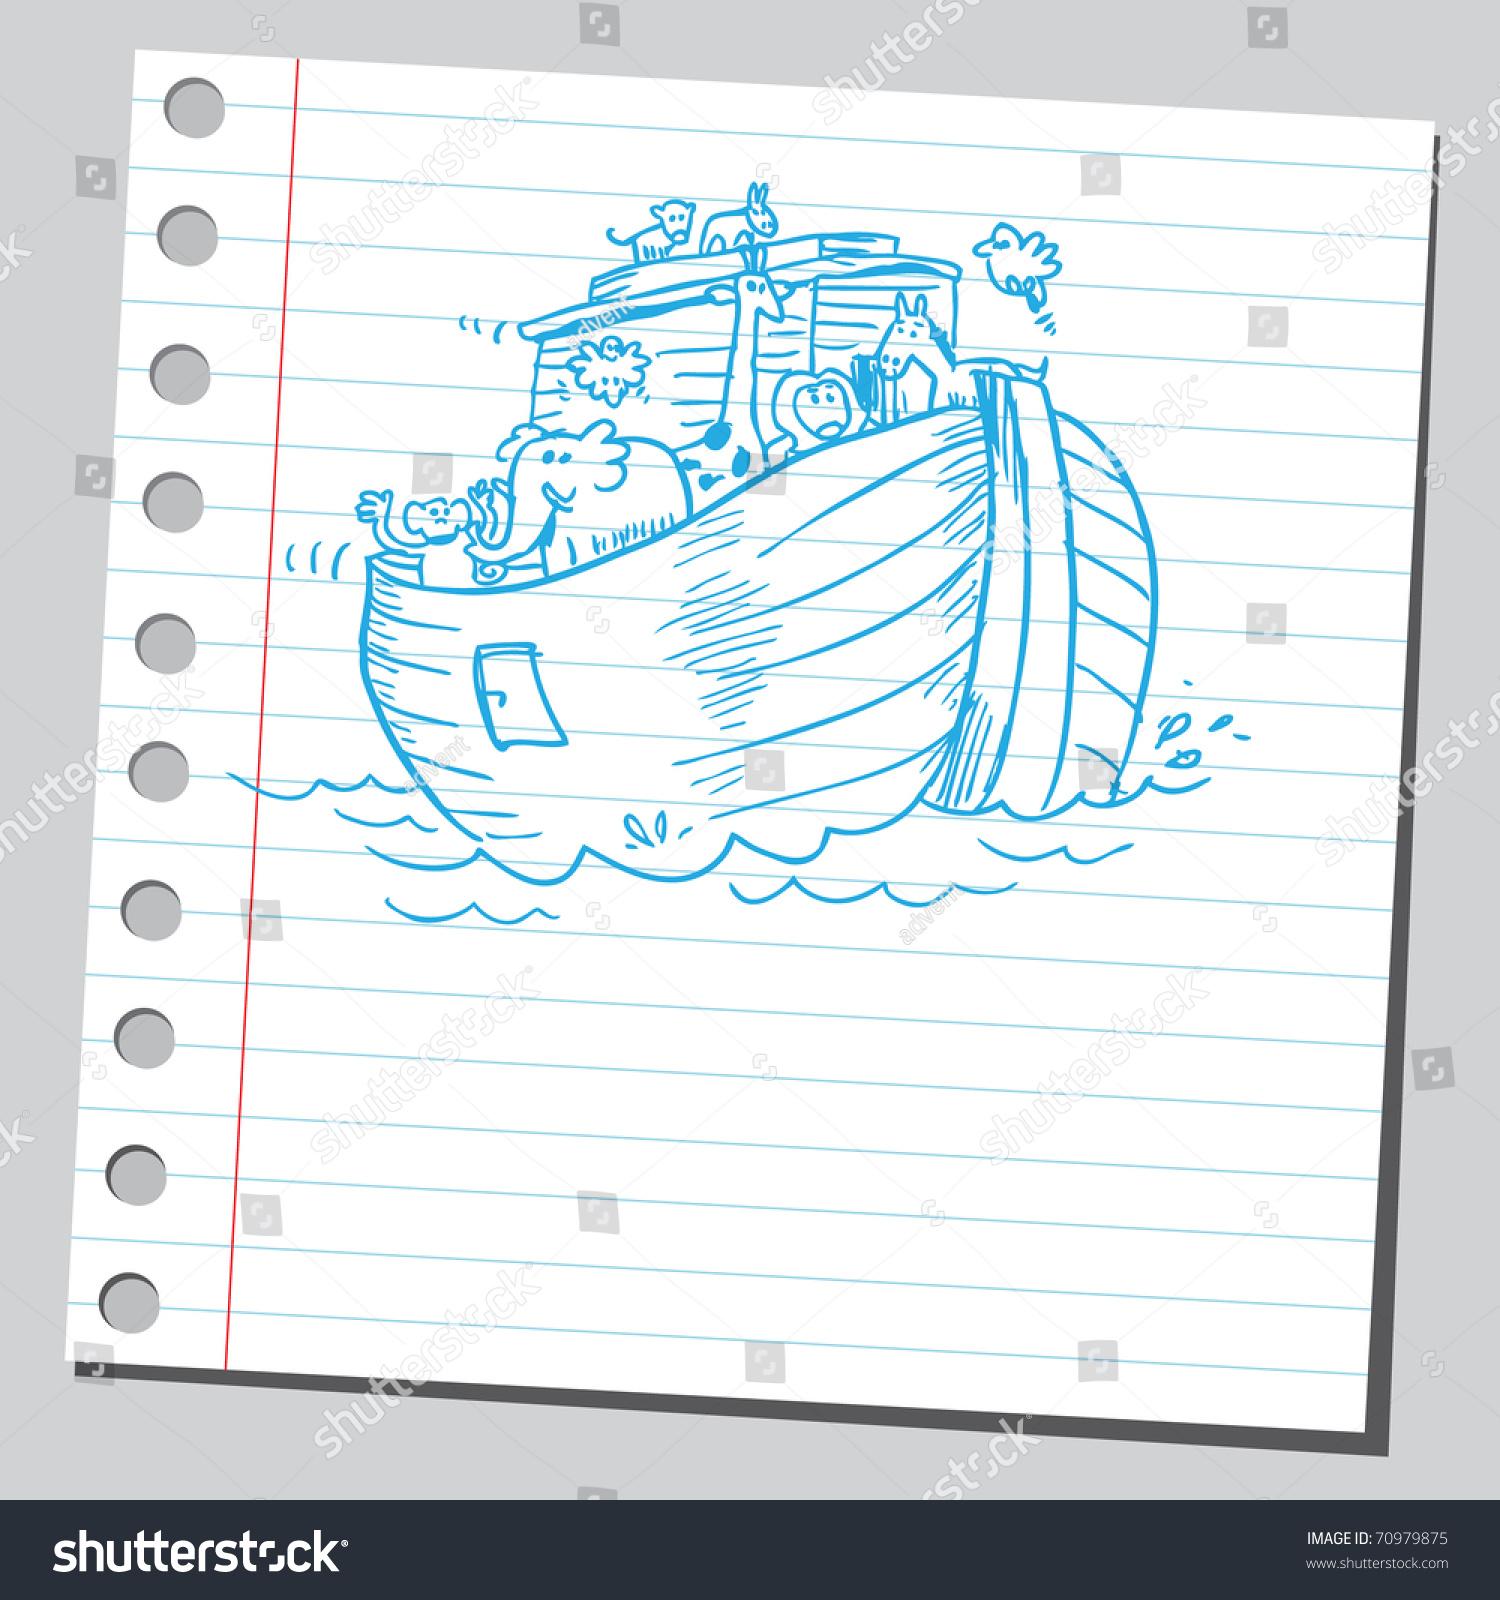 hight resolution of sketchy illustration of a noah s ark